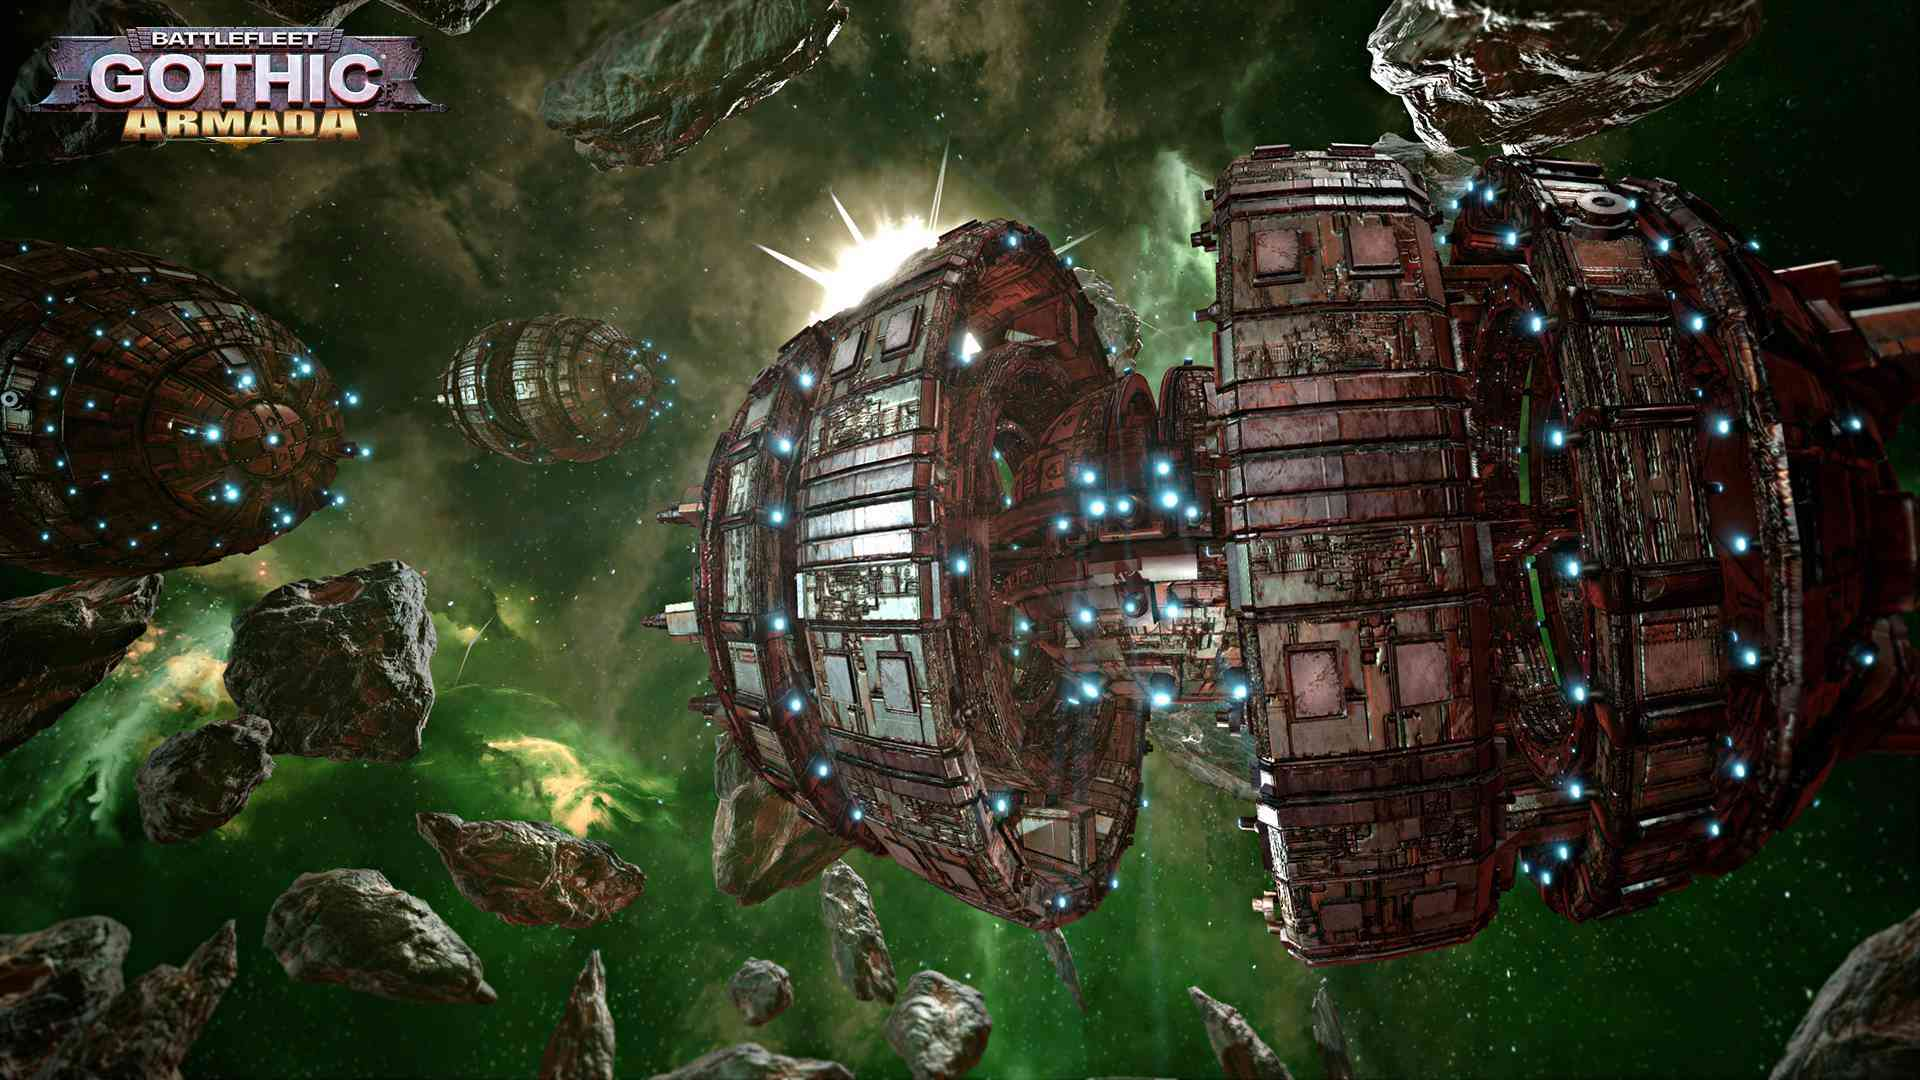 [Jeu vidéo] Battlefleet Gothic : Armada - Page 18 14241410